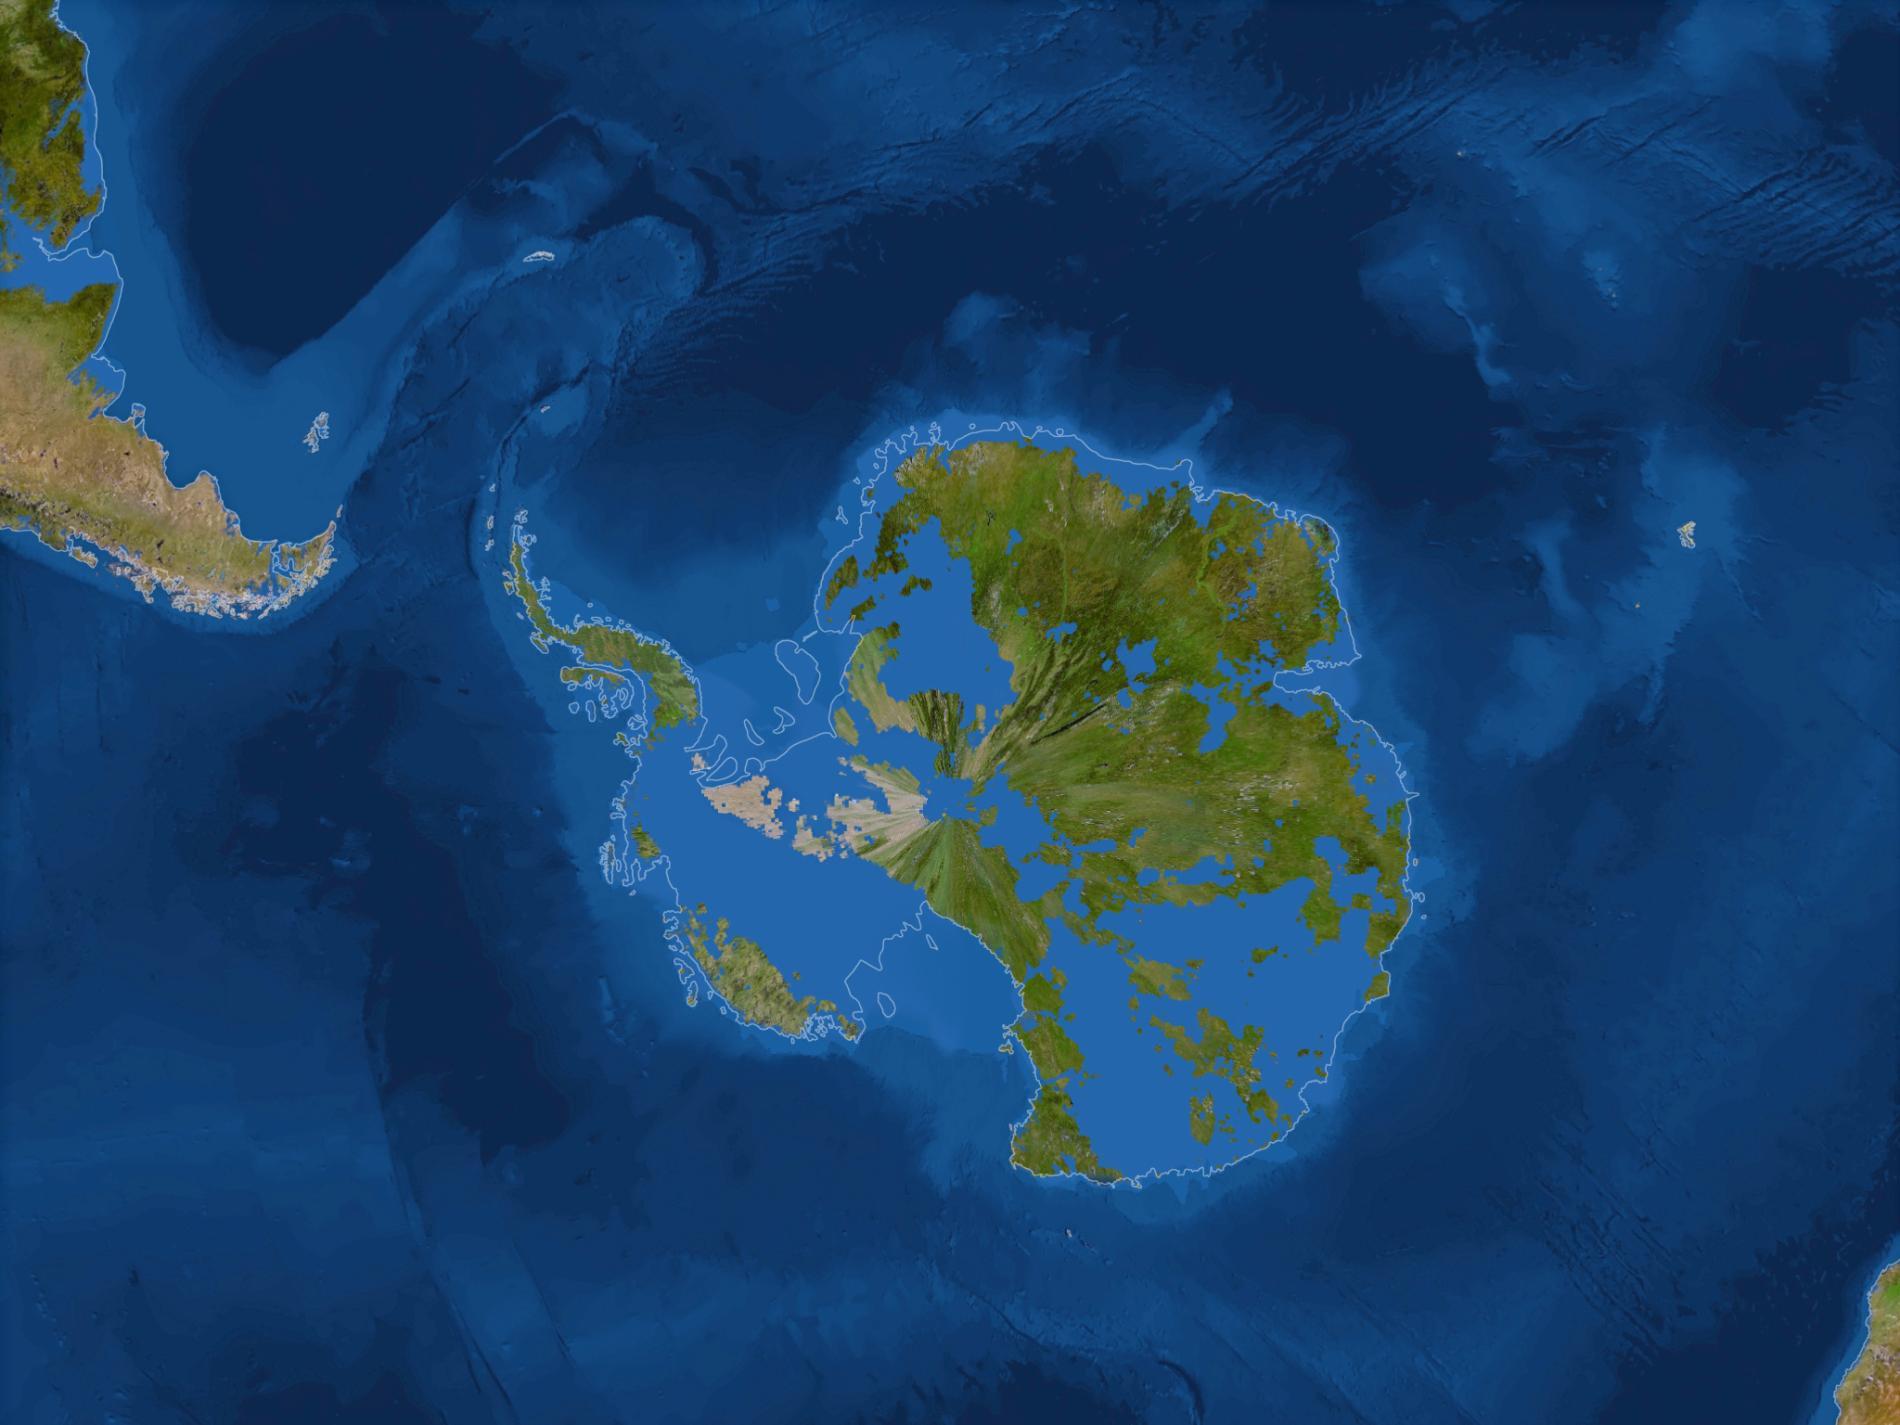 07-ice-melt-antarctica.adapt.1900.1